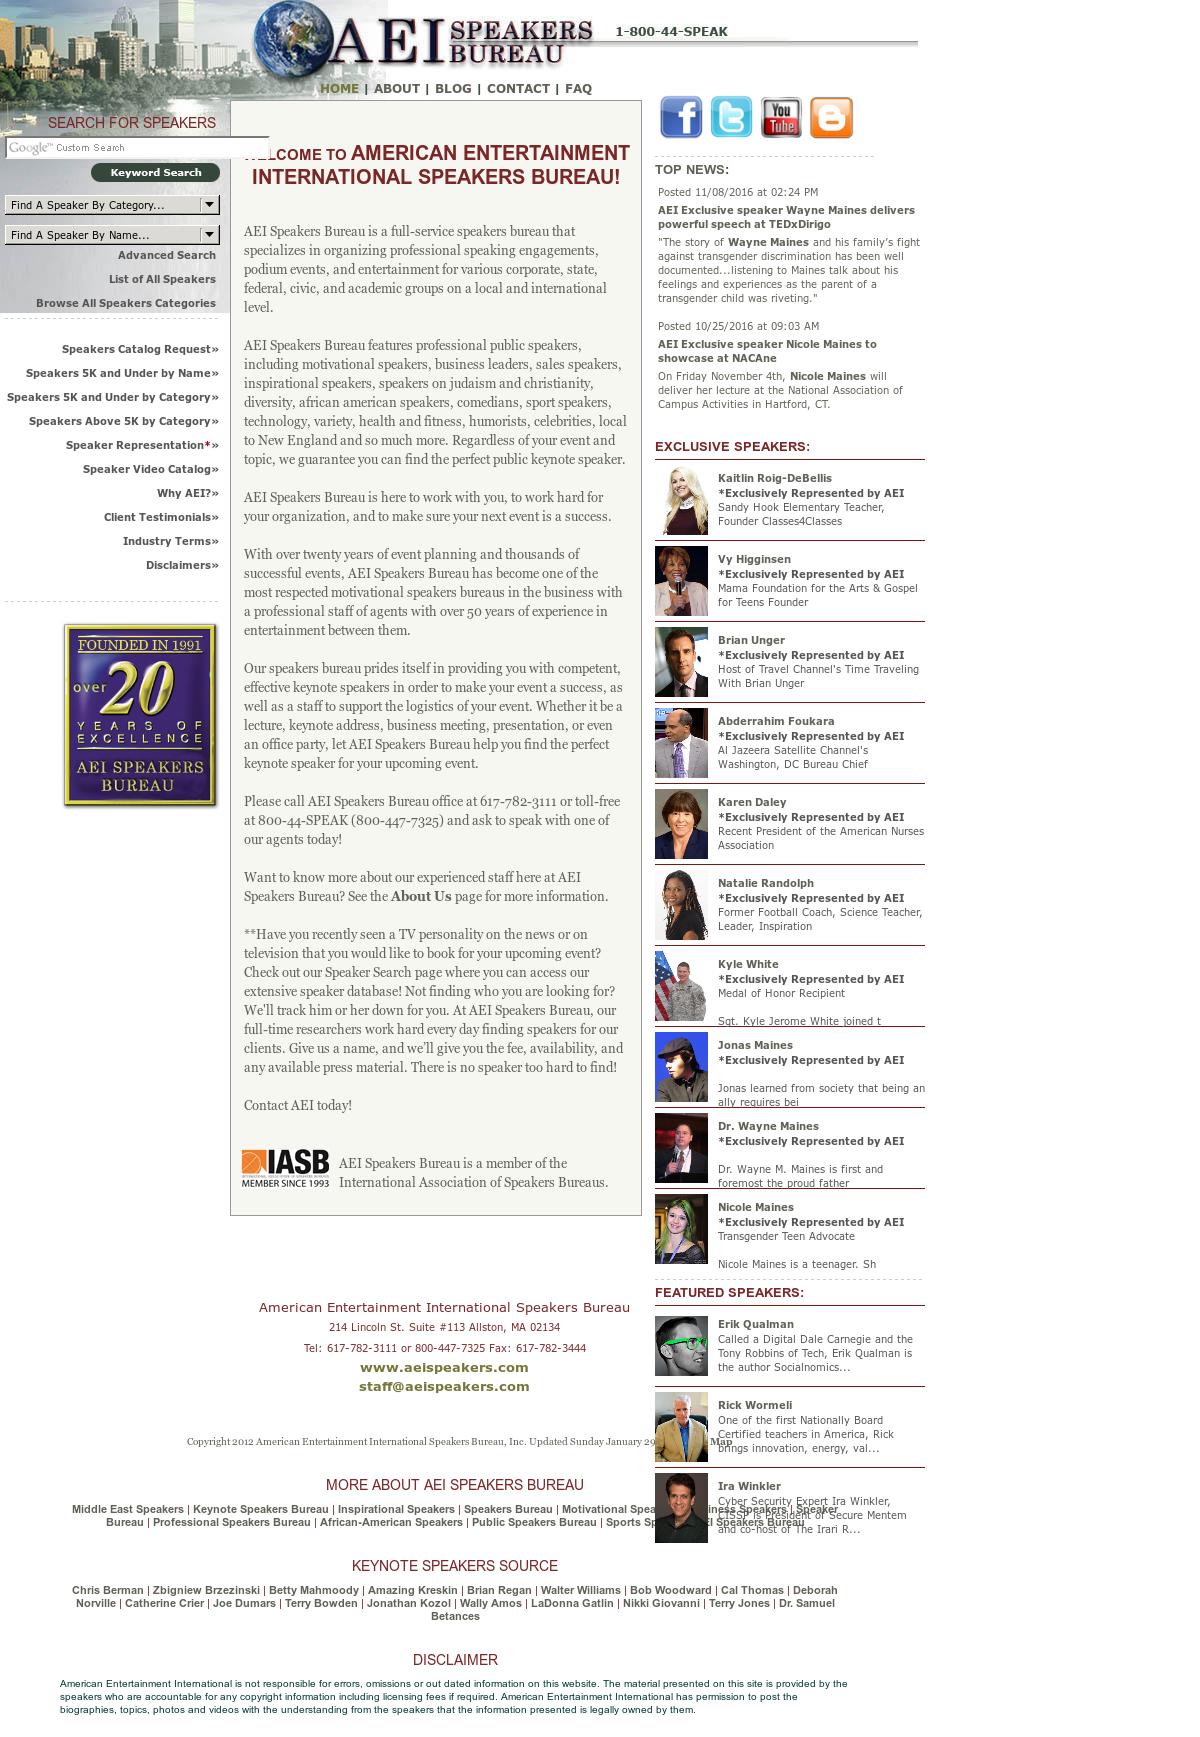 AEI Speakers Bureau Competitors, Revenue and Employees